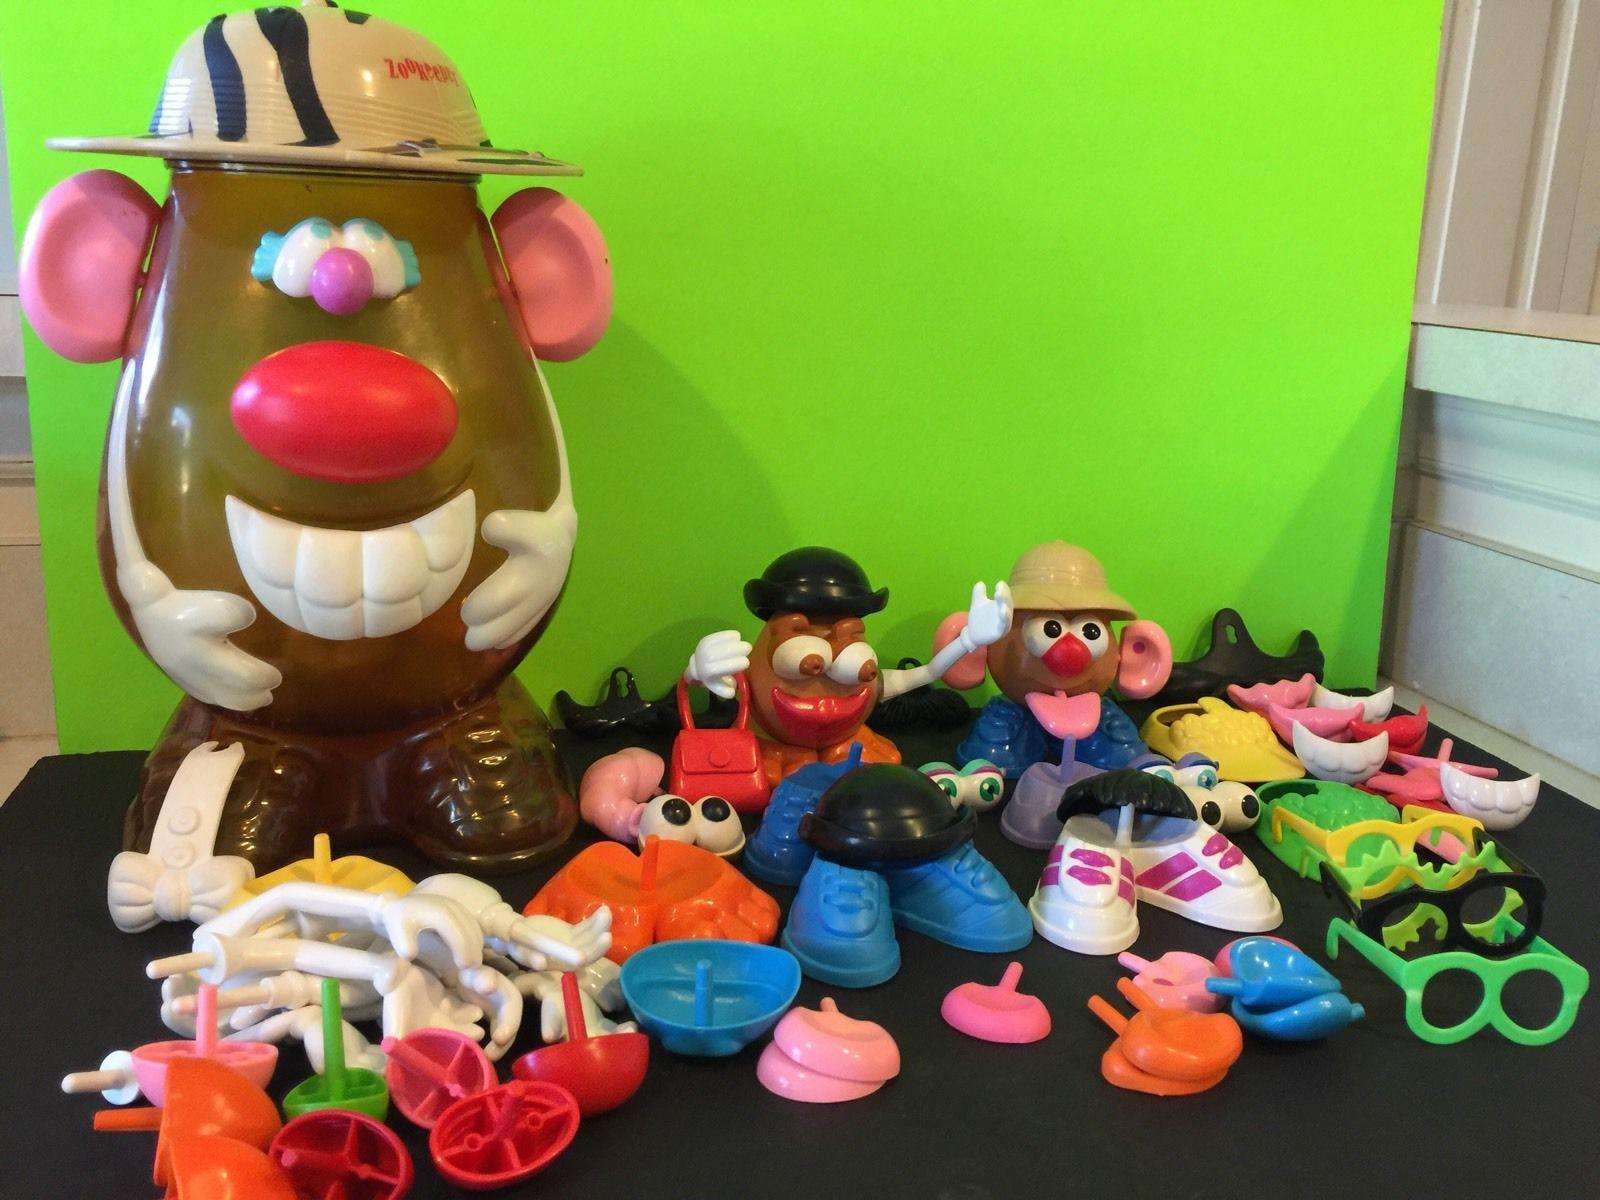 Mr Potato Head Zookeeper Playset Over 85 Pieces   eBay